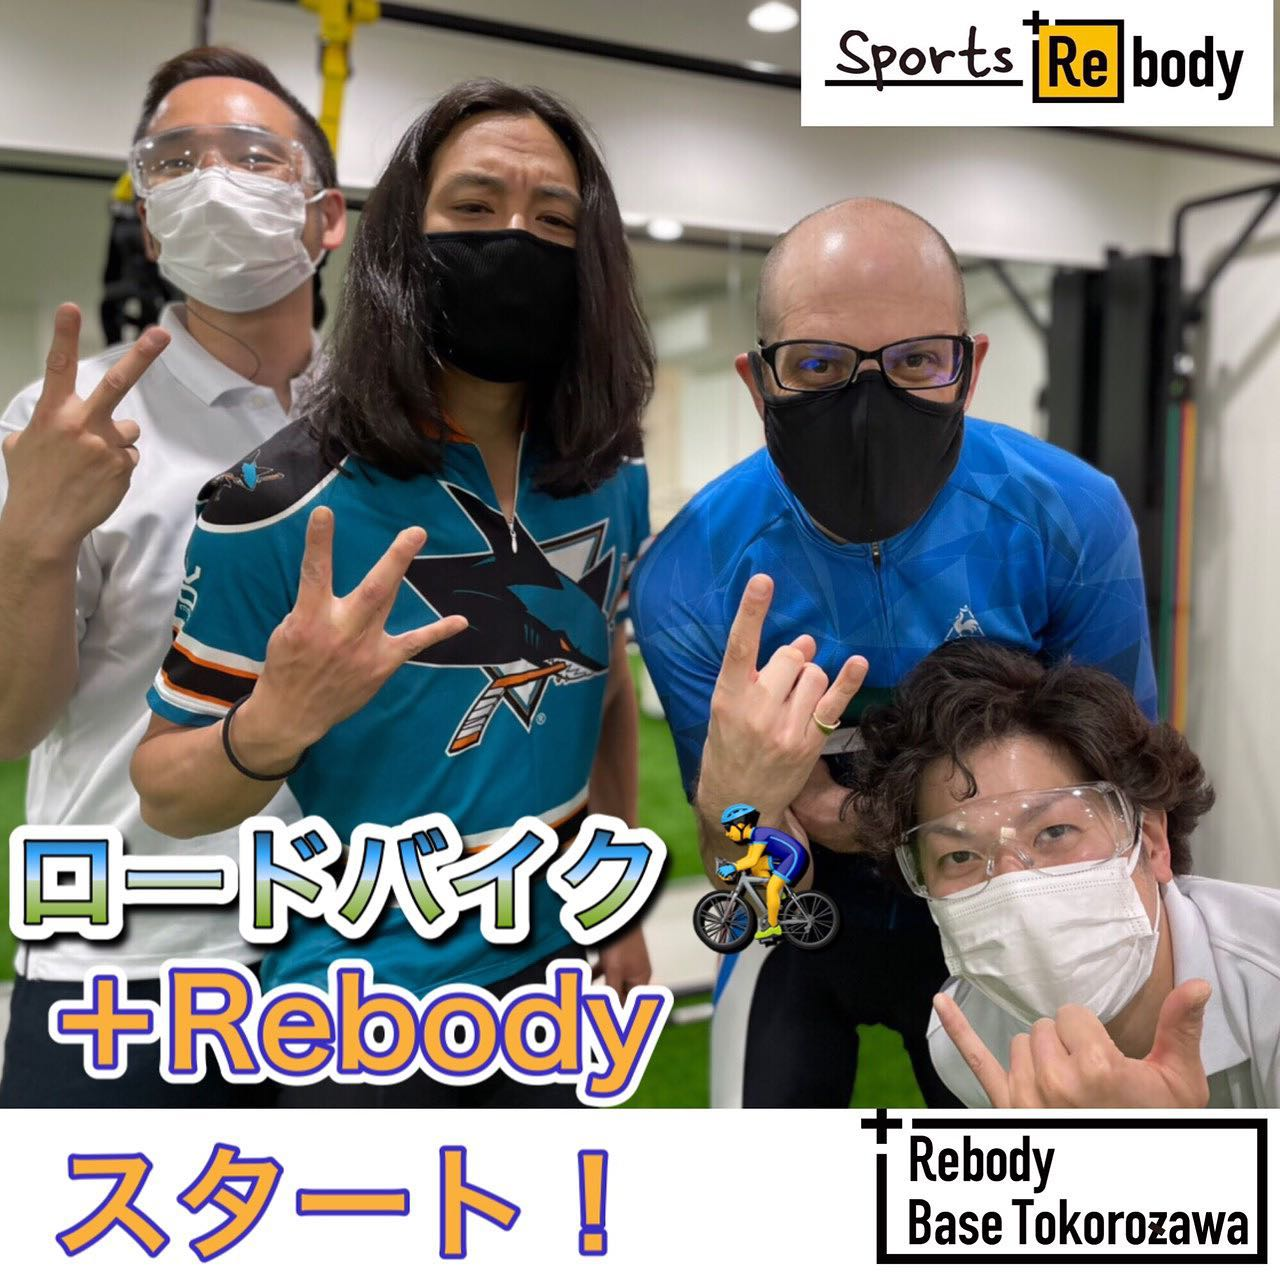 『 愛泉道院+Rebody       base Tokorozawa』